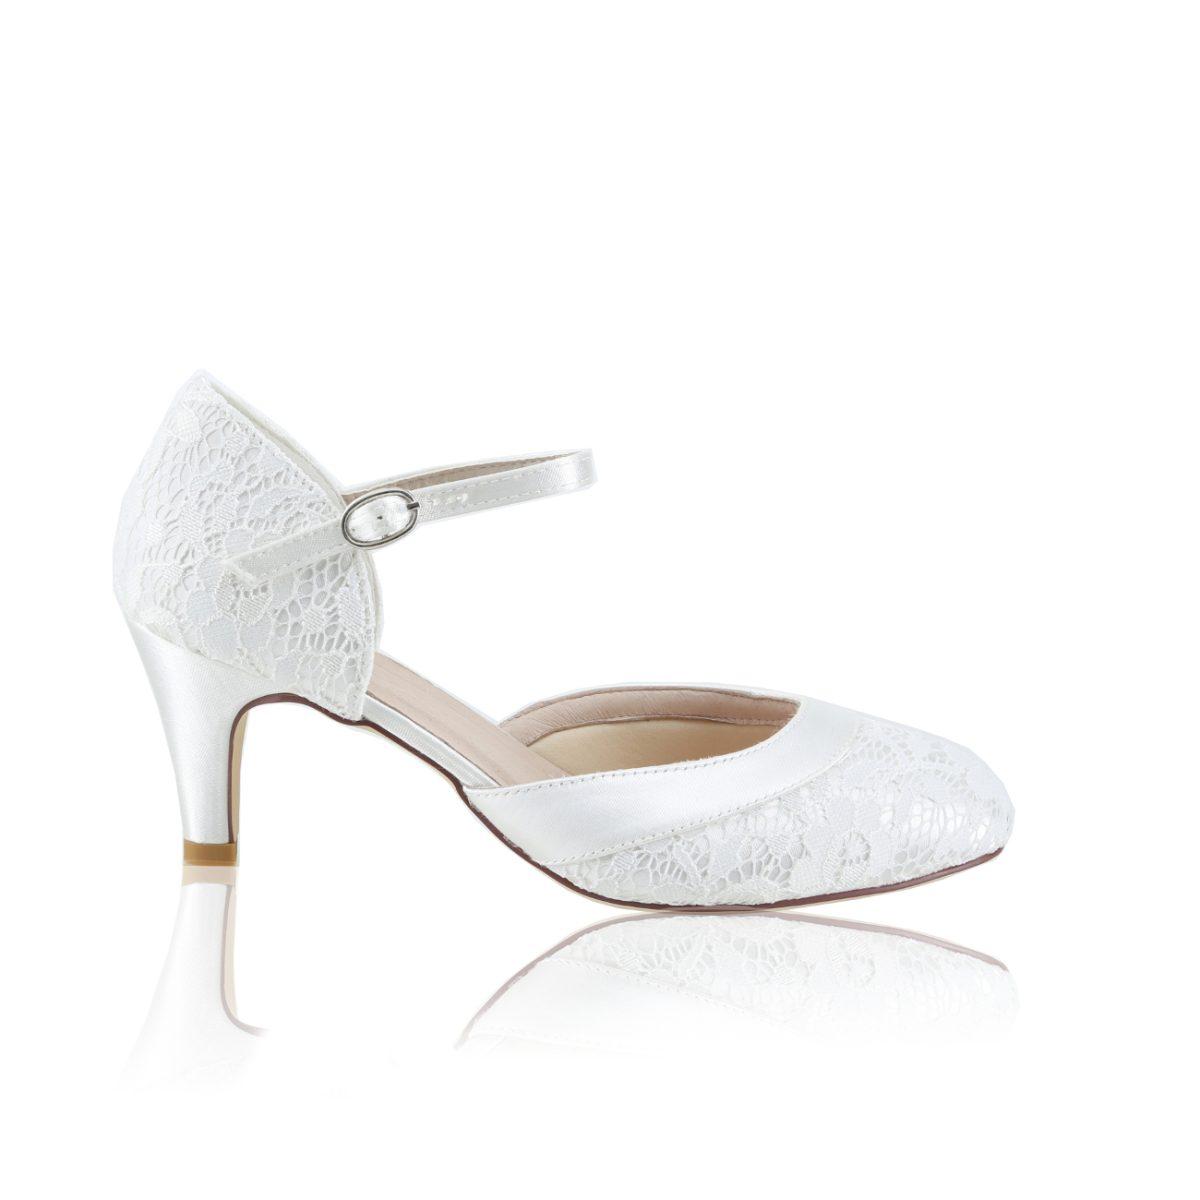 Perfect Bridal Elsa Shoes - Lace